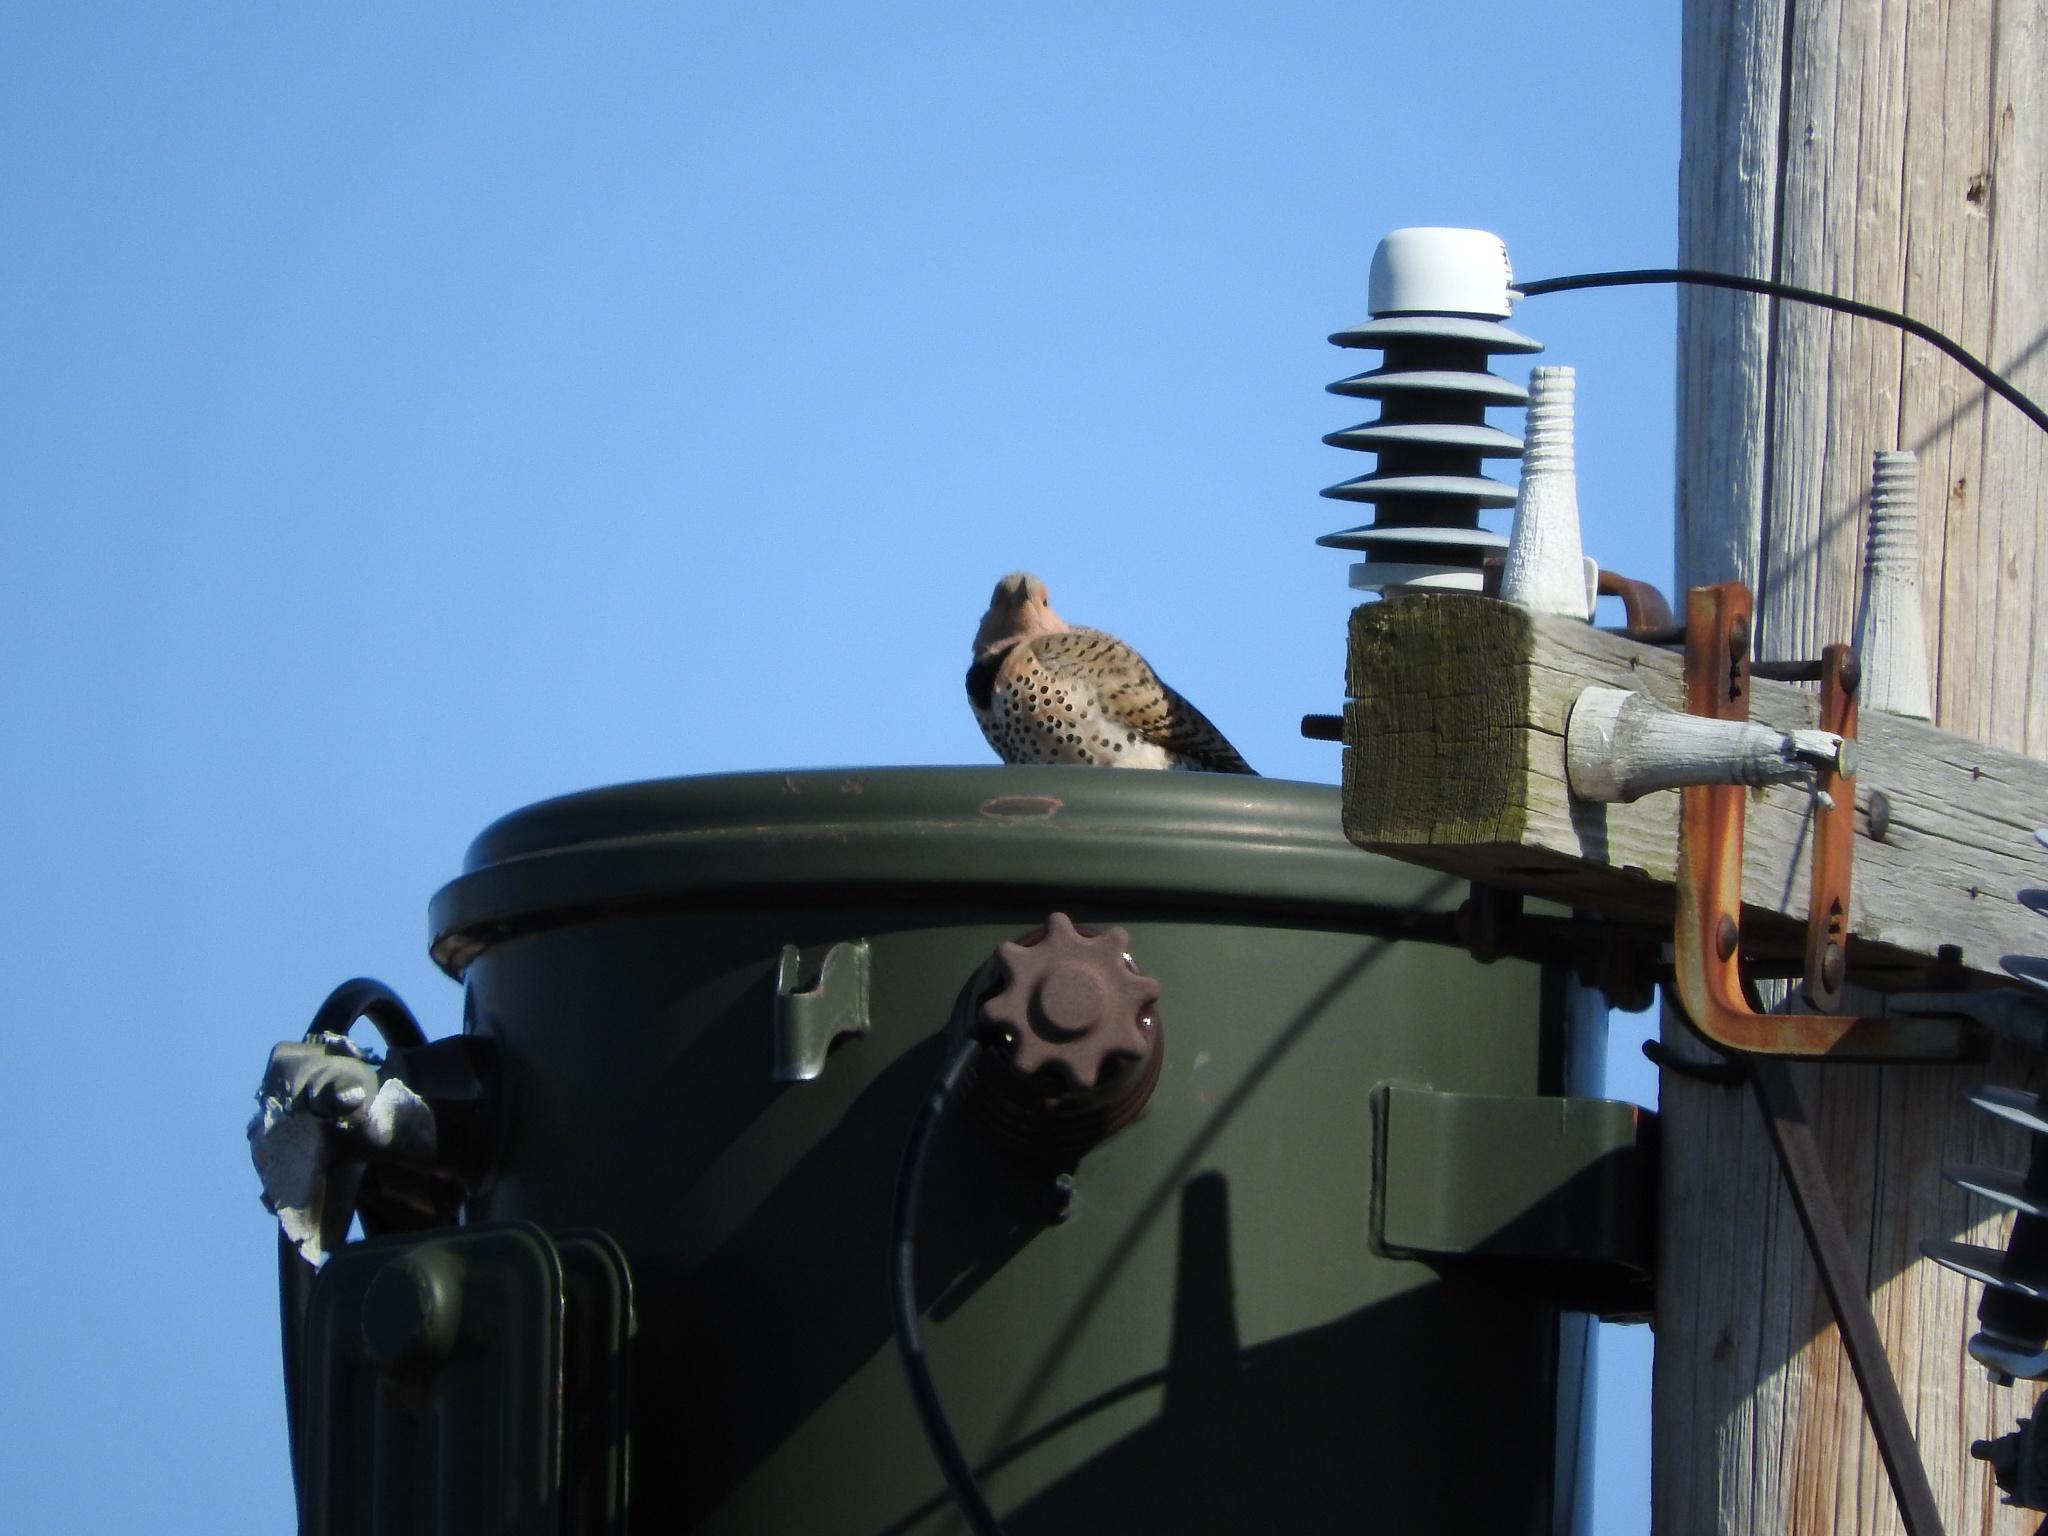 Another neighbourhood watcher :) by Lorraine Furmanic